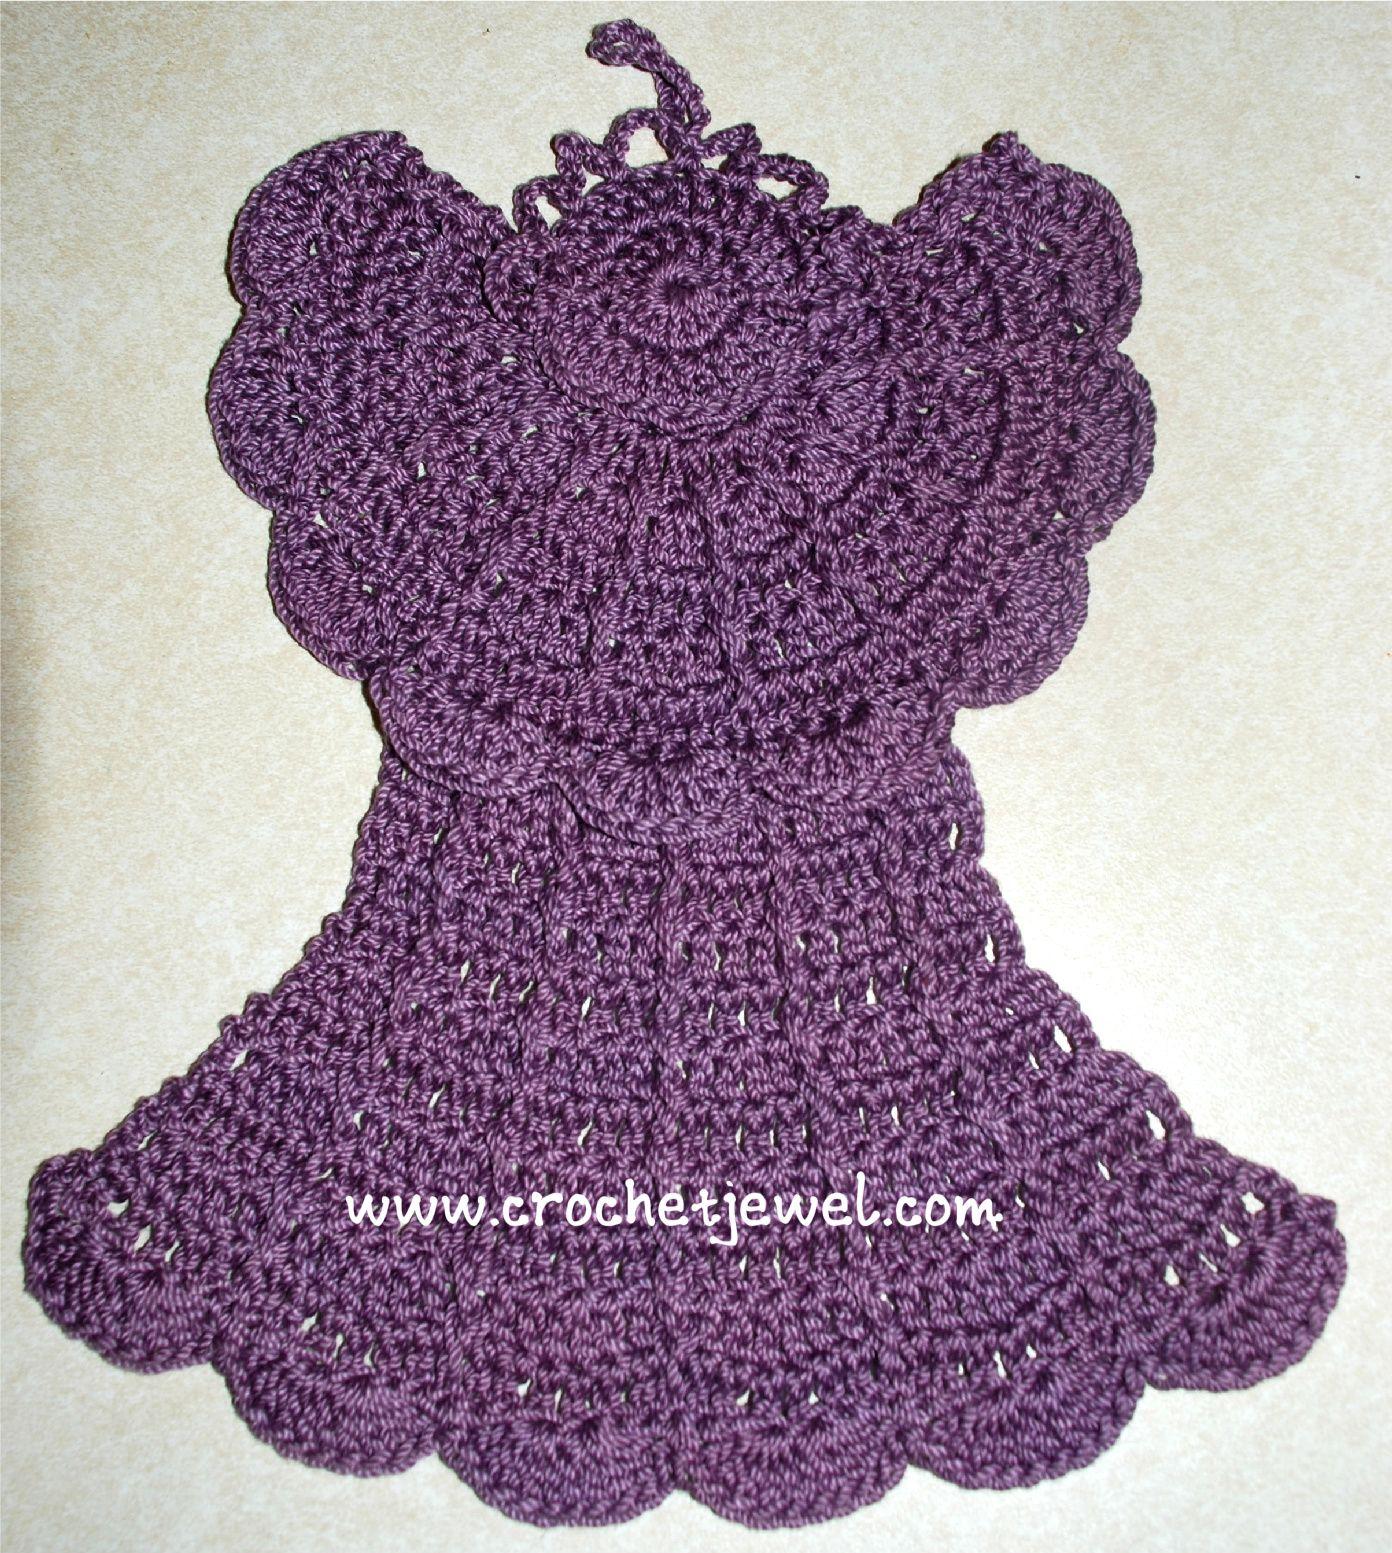 Pretty crochet patterns | Crochet Angel Dishcloth | Crochet ...